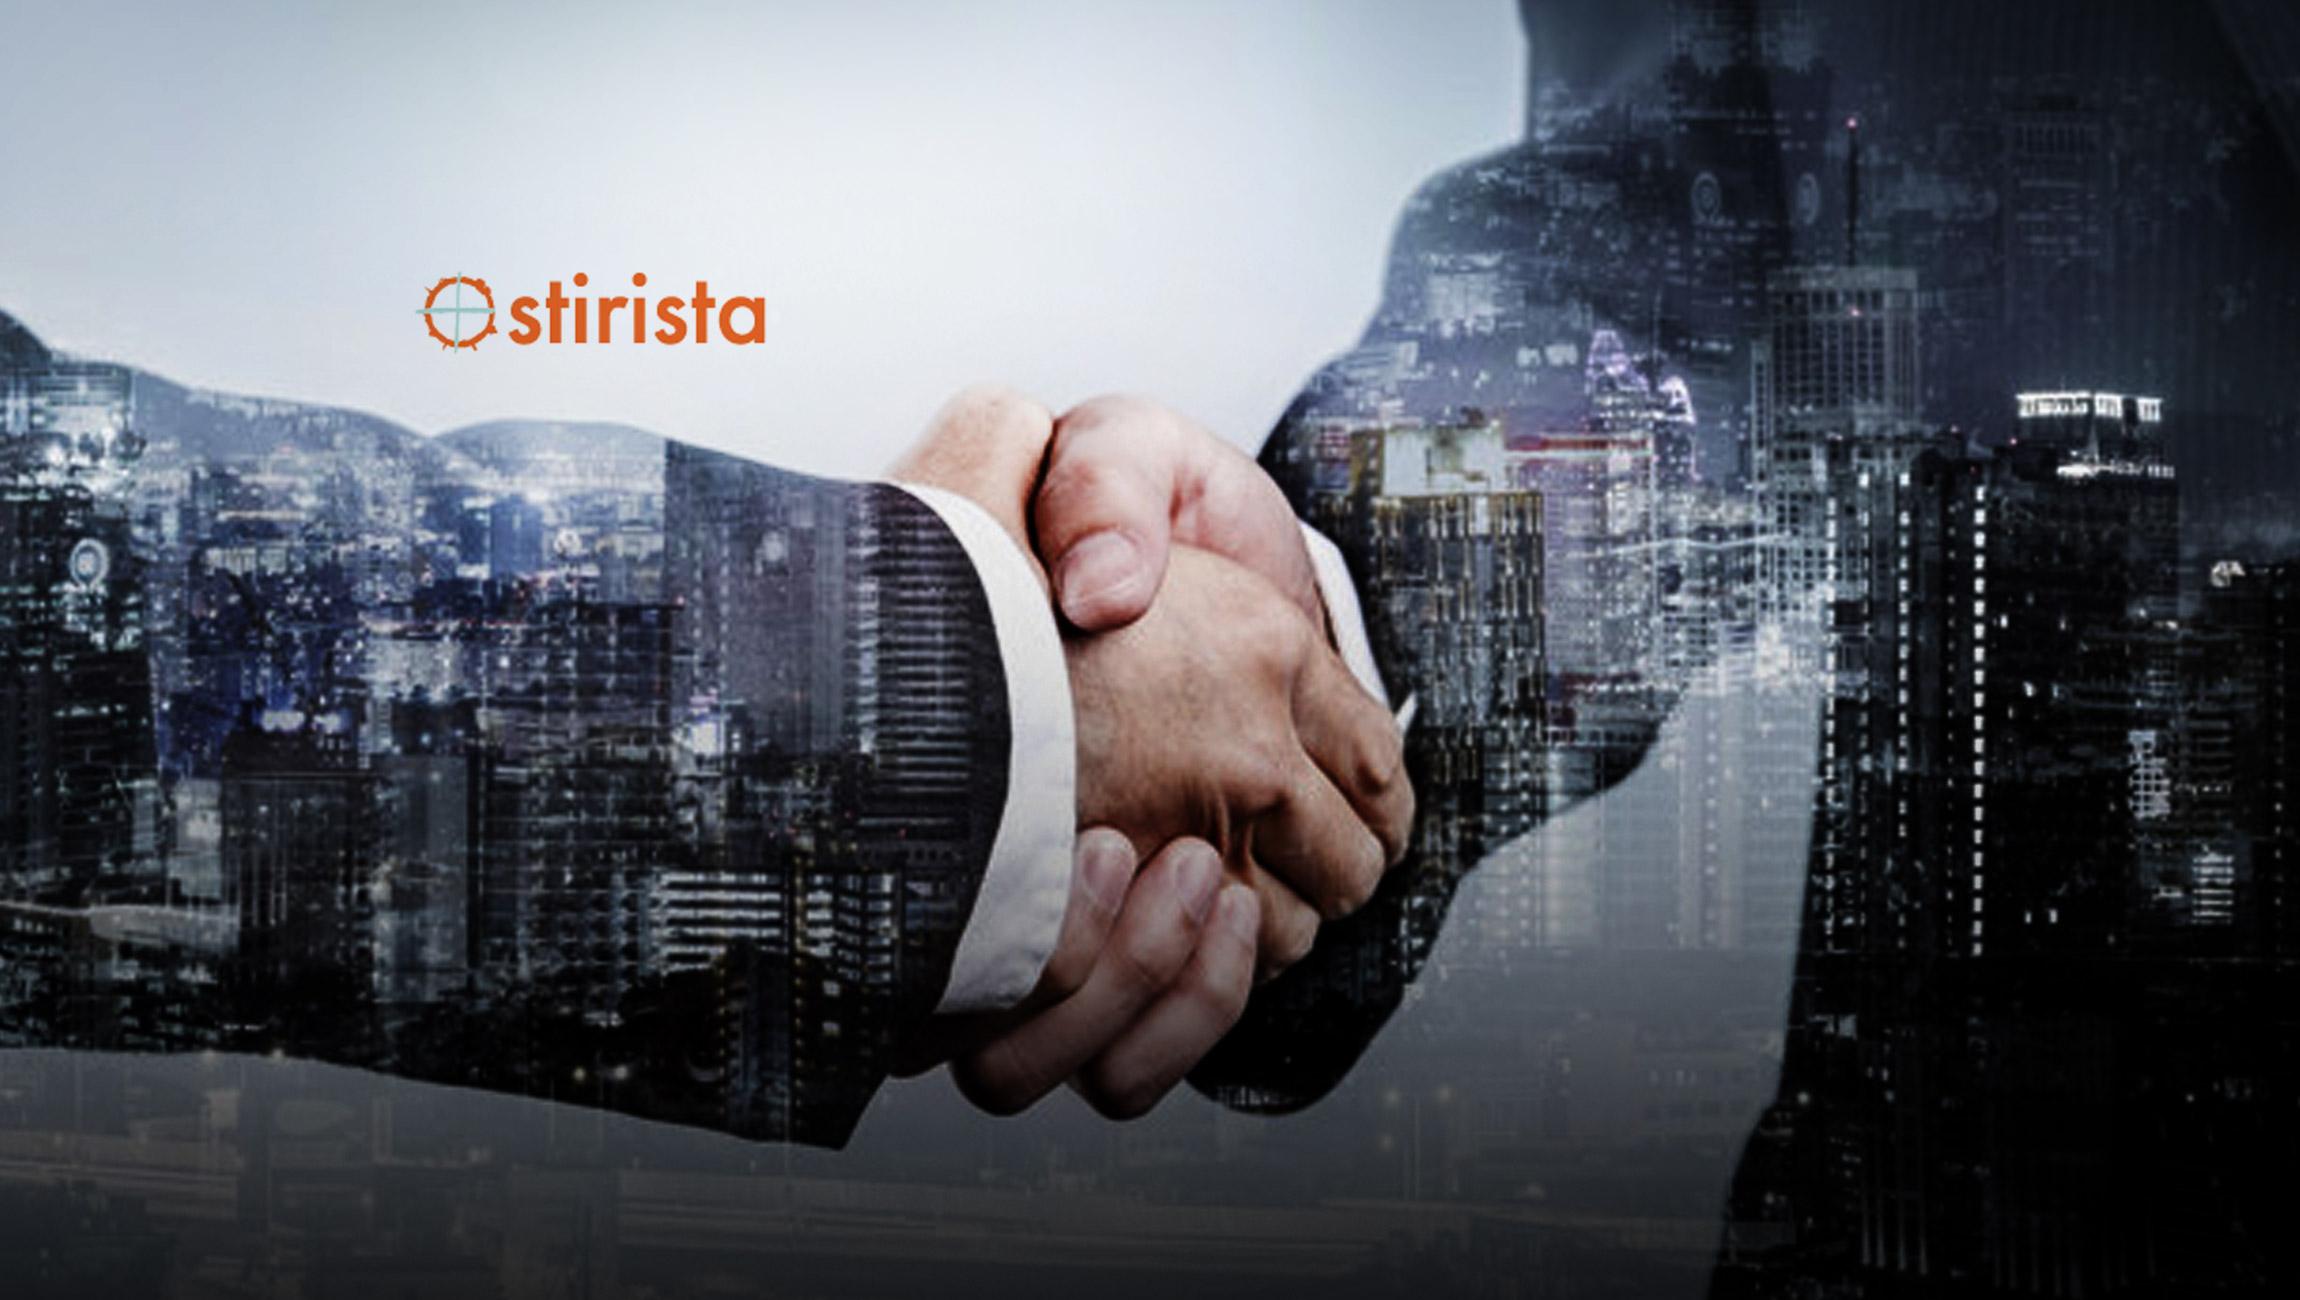 Stirista Acquires Nikaza's Attribution and Location Intelligence Engine